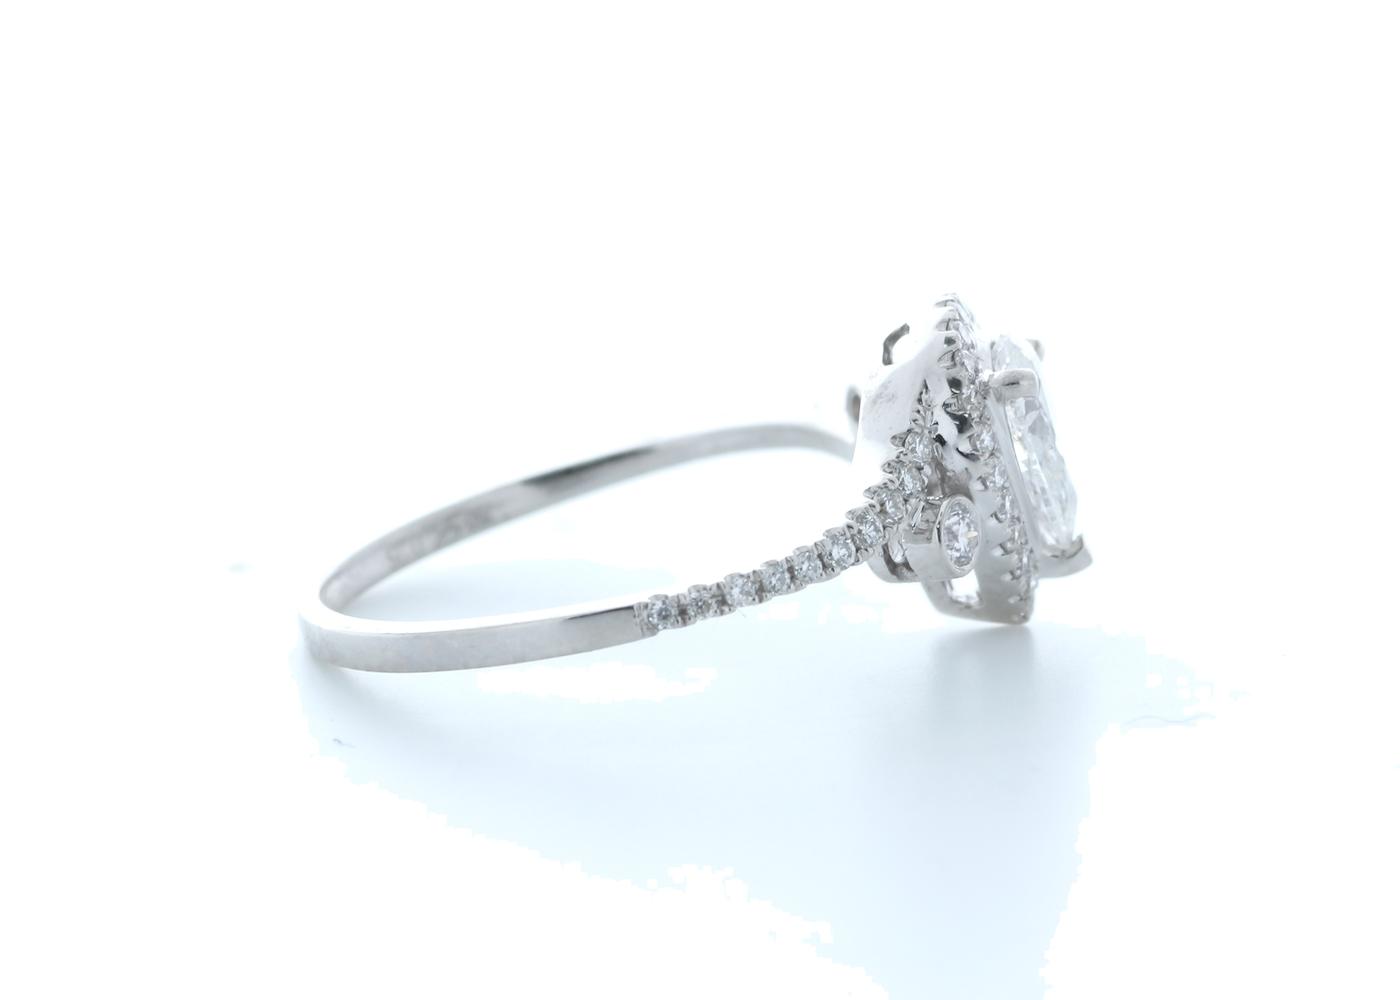 18ct White Gold Pear Shape Halo Diamond Ring 0.76 (0.51) Carats - Image 4 of 5